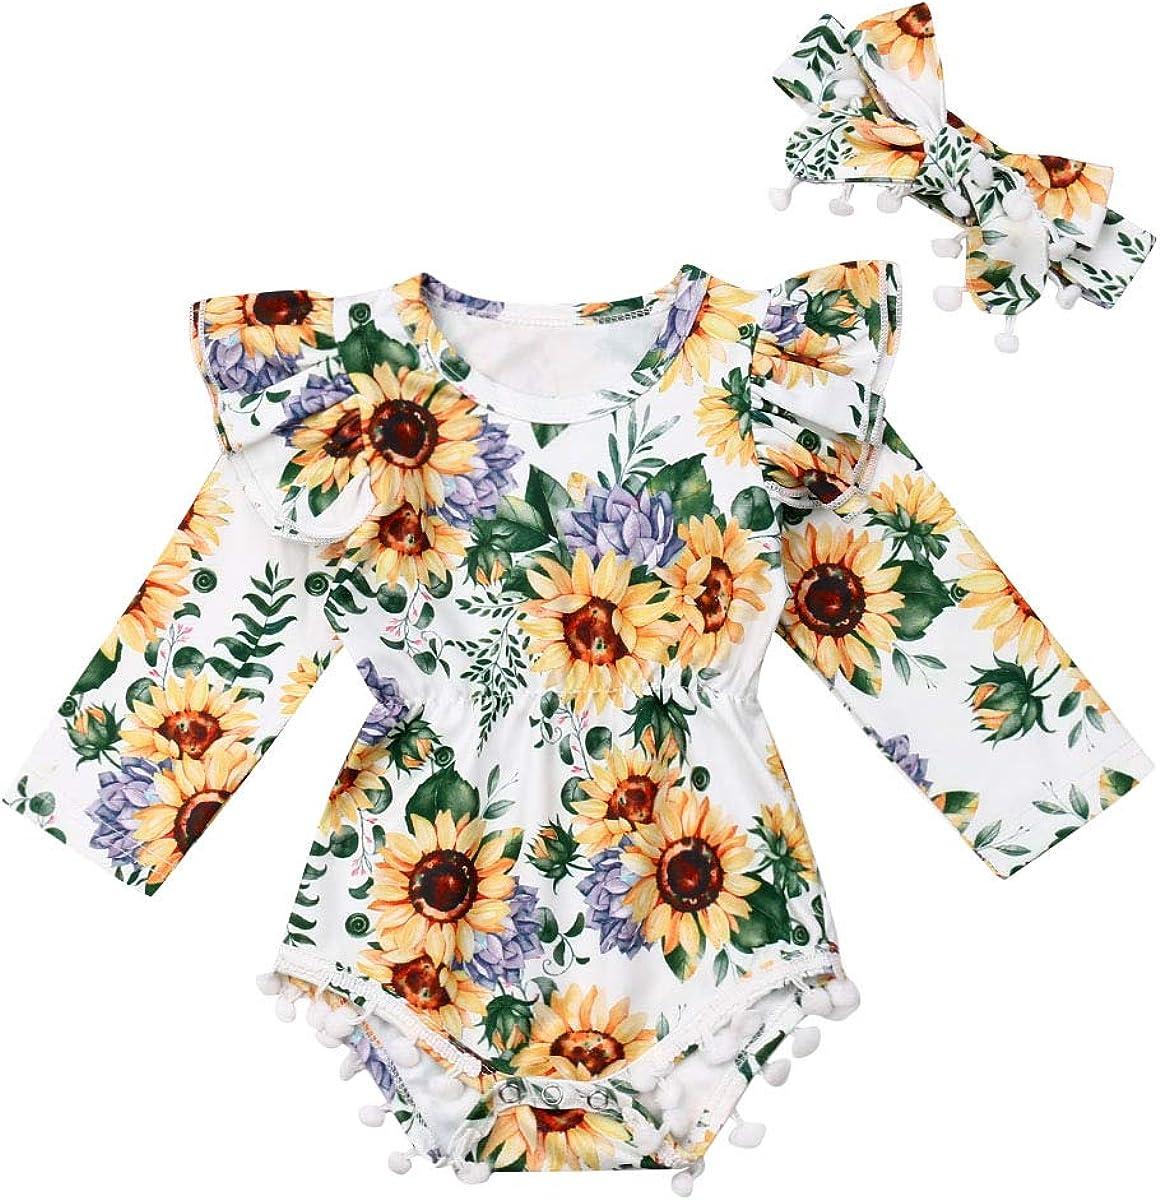 Newborn Kids Clothing Baby Girls Cute Sunflower Ju free Romper Halter shopping